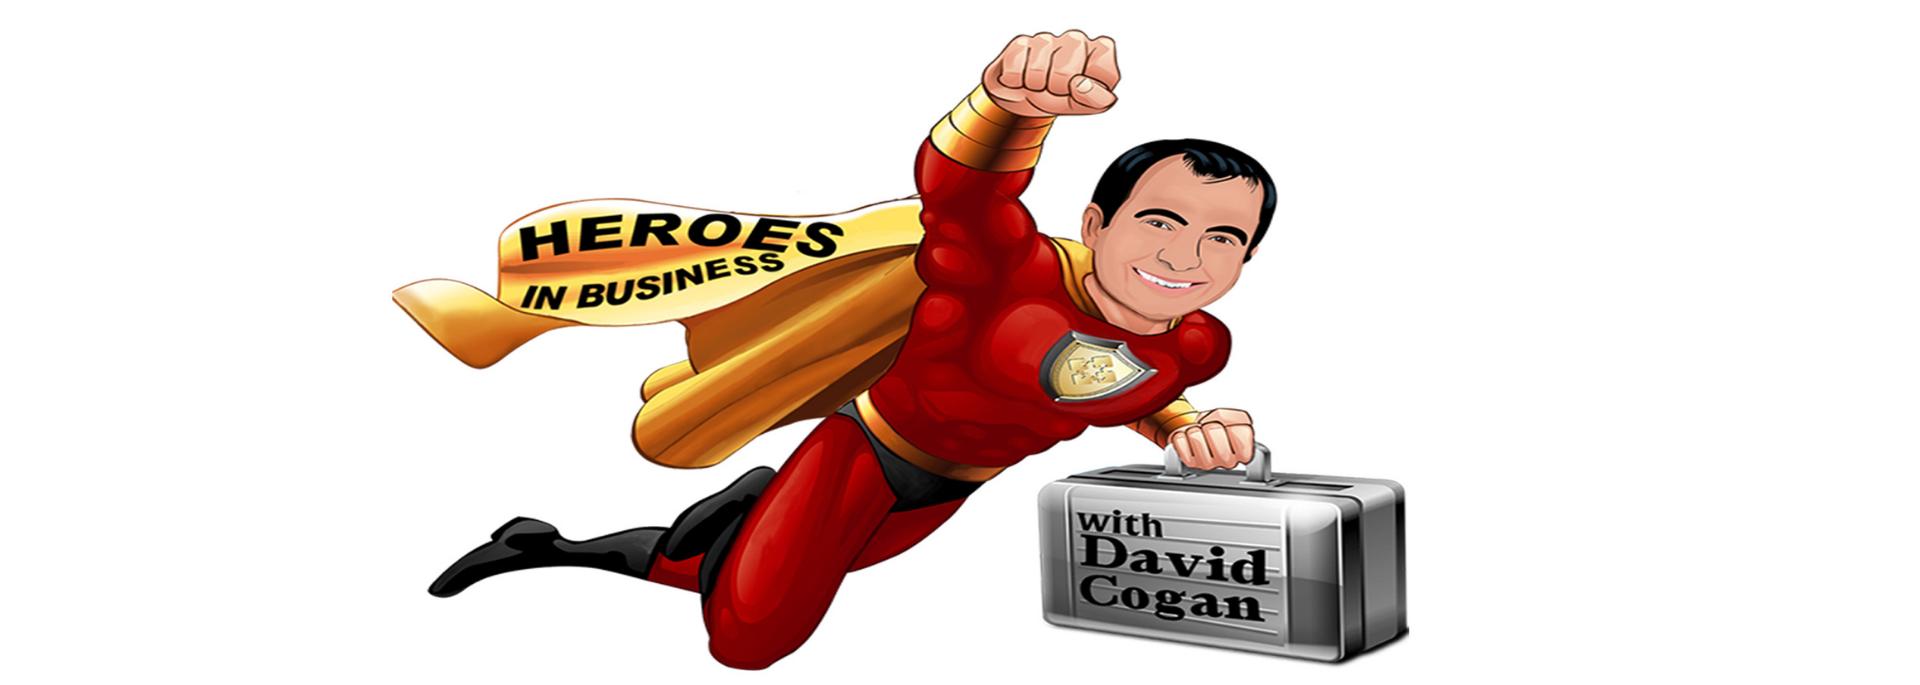 Eliances Heroes in Business channel